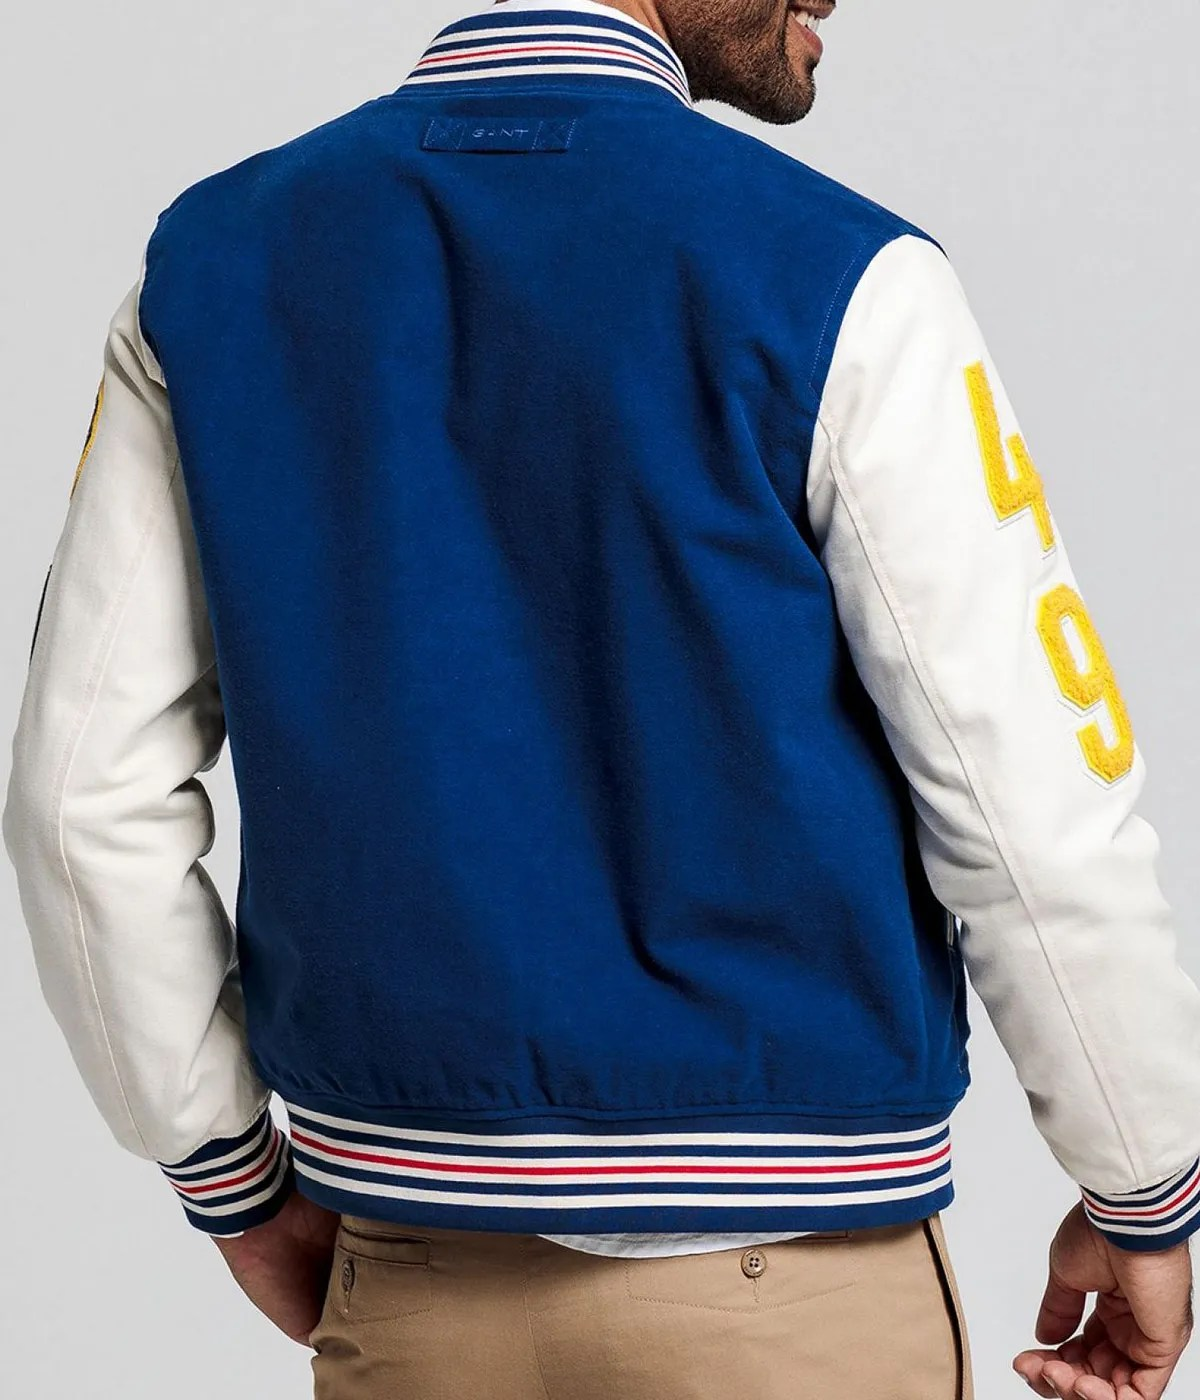 the-gant-letterman-gant-spring-jacket